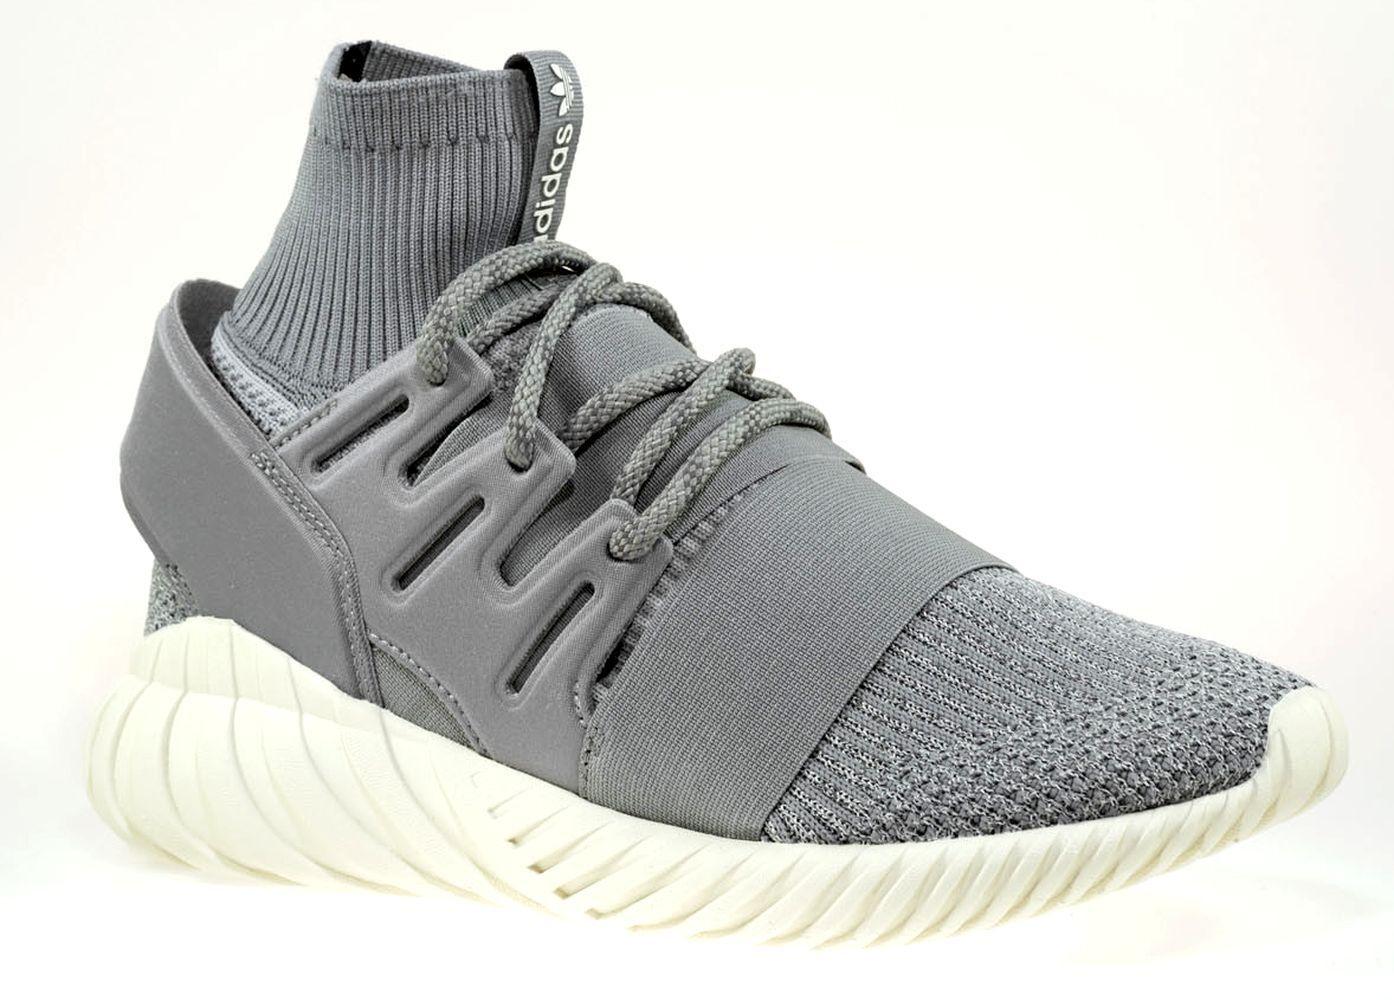 Adidas S74920 Tubular Doom PK Herren Schuhe Sport Turnschuhe Stiefel 44 USA 10 Grau    |  | Sonderangebot  | Niedrige Kosten